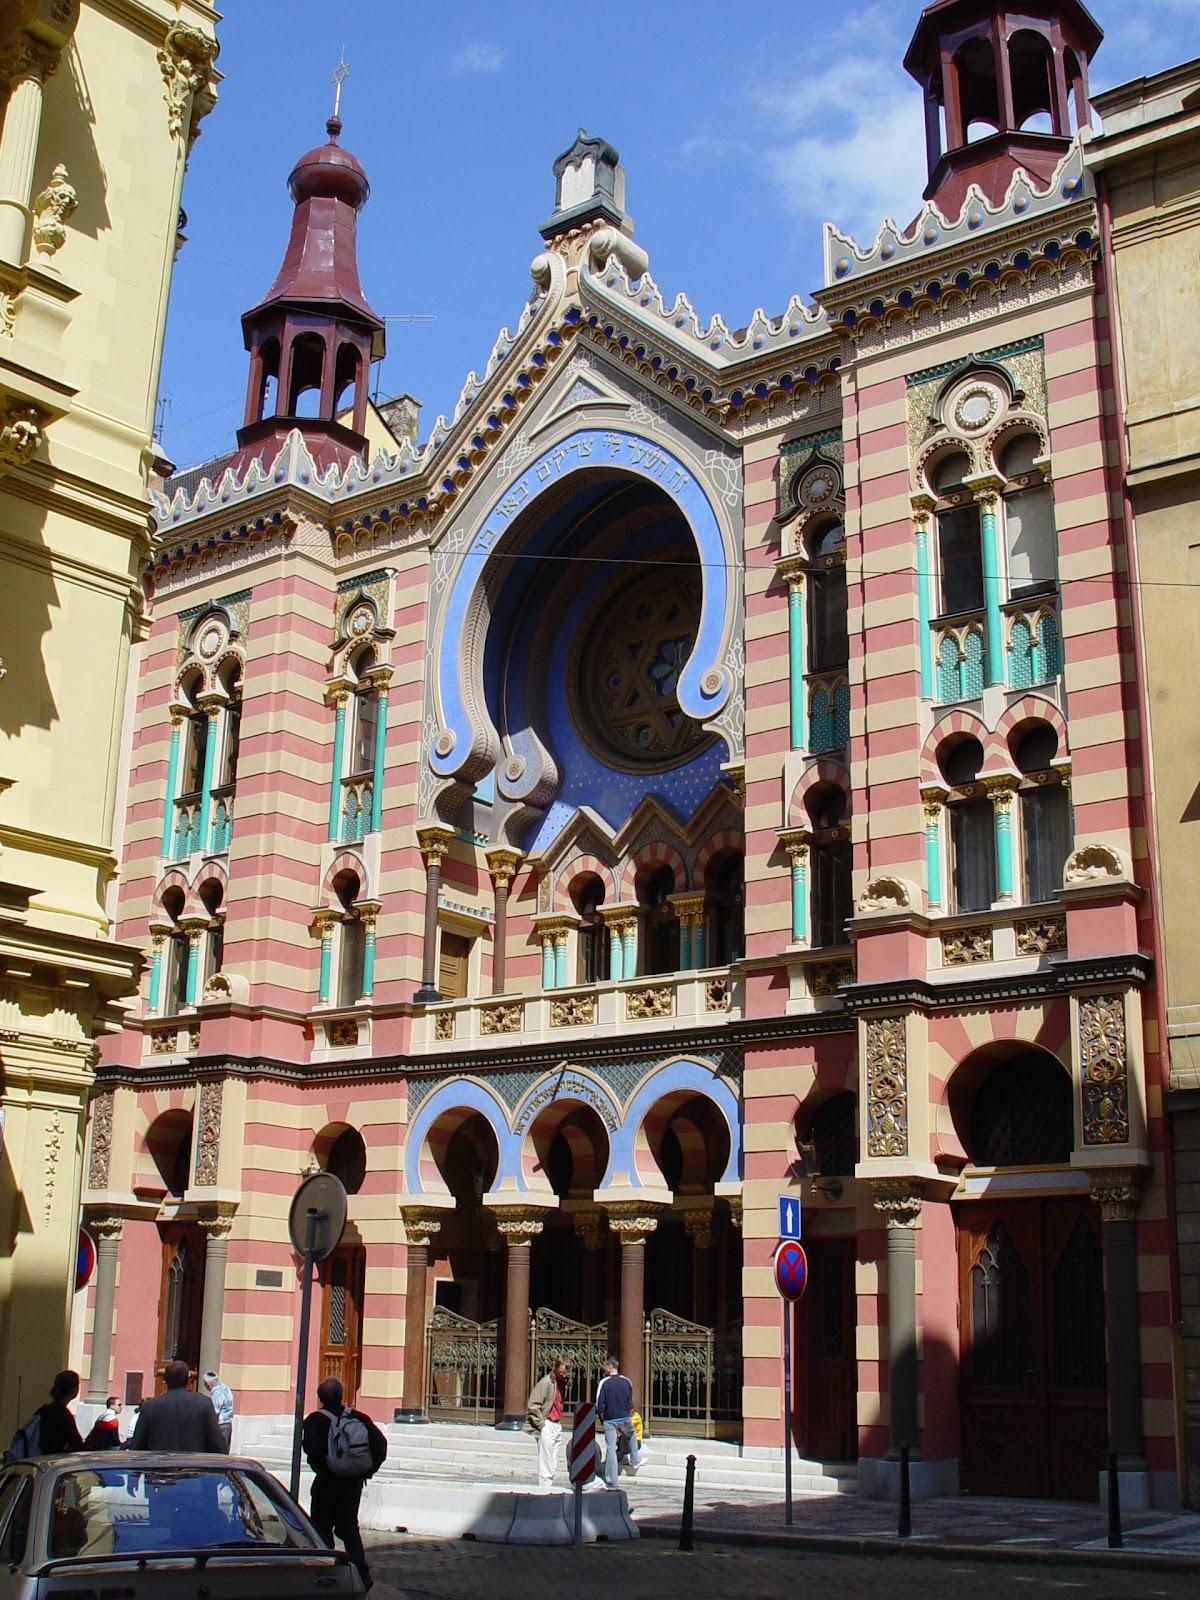 https://upload.wikimedia.org/wikipedia/commons/3/3e/Prague_-_Jerusalemer_Synagoge.jpg